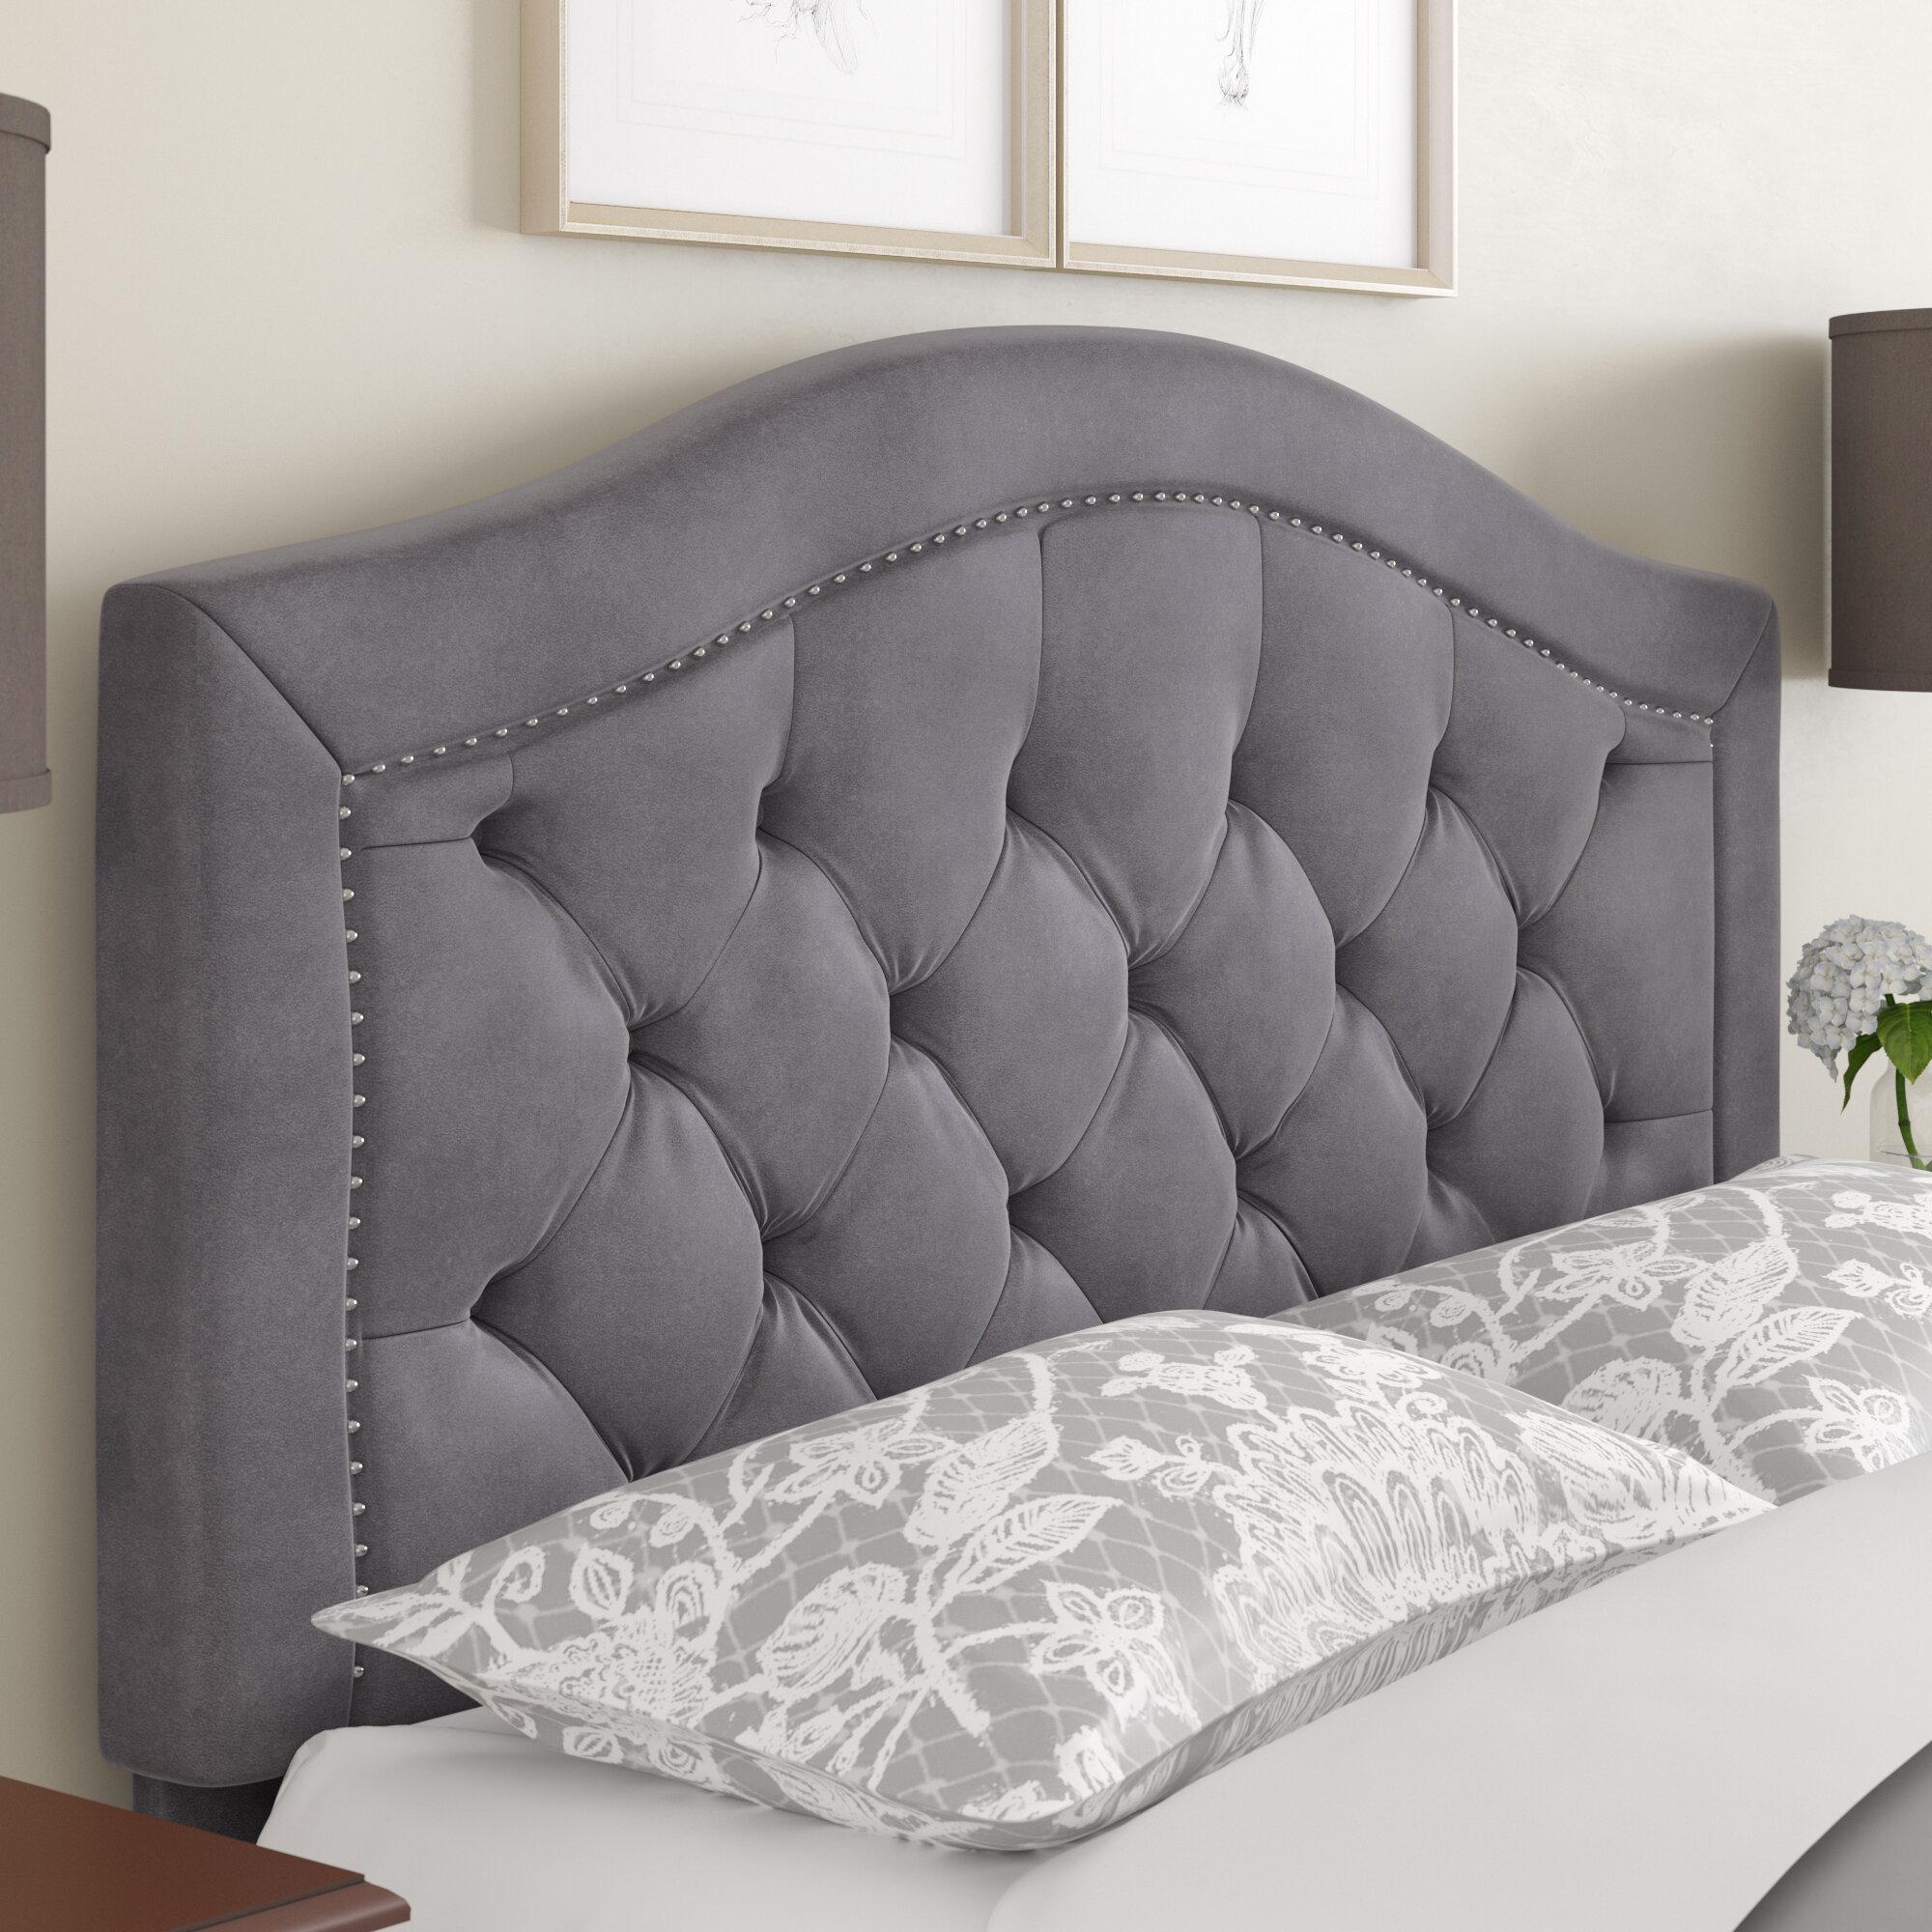 sale retailer 043a4 eacff Gossman Upholstered Panel Headboard